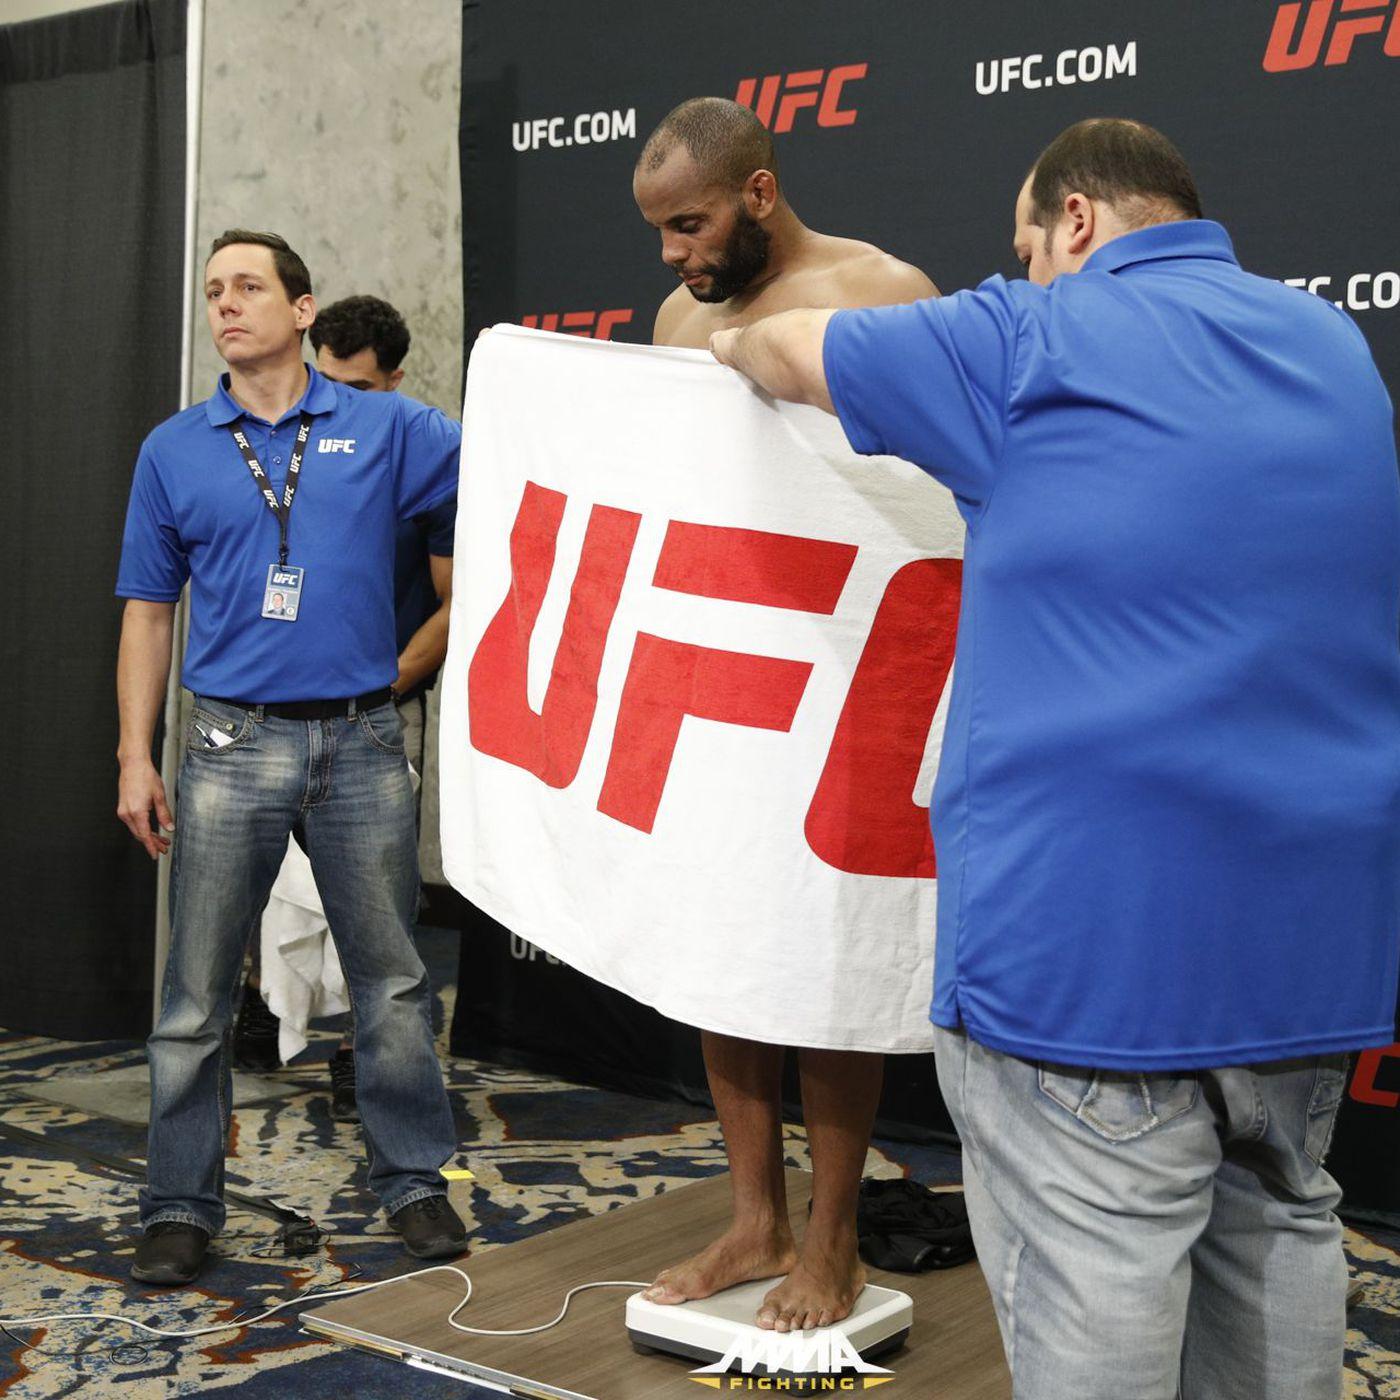 Pros react to Daniel Cormier's controversial UFC 210 weigh